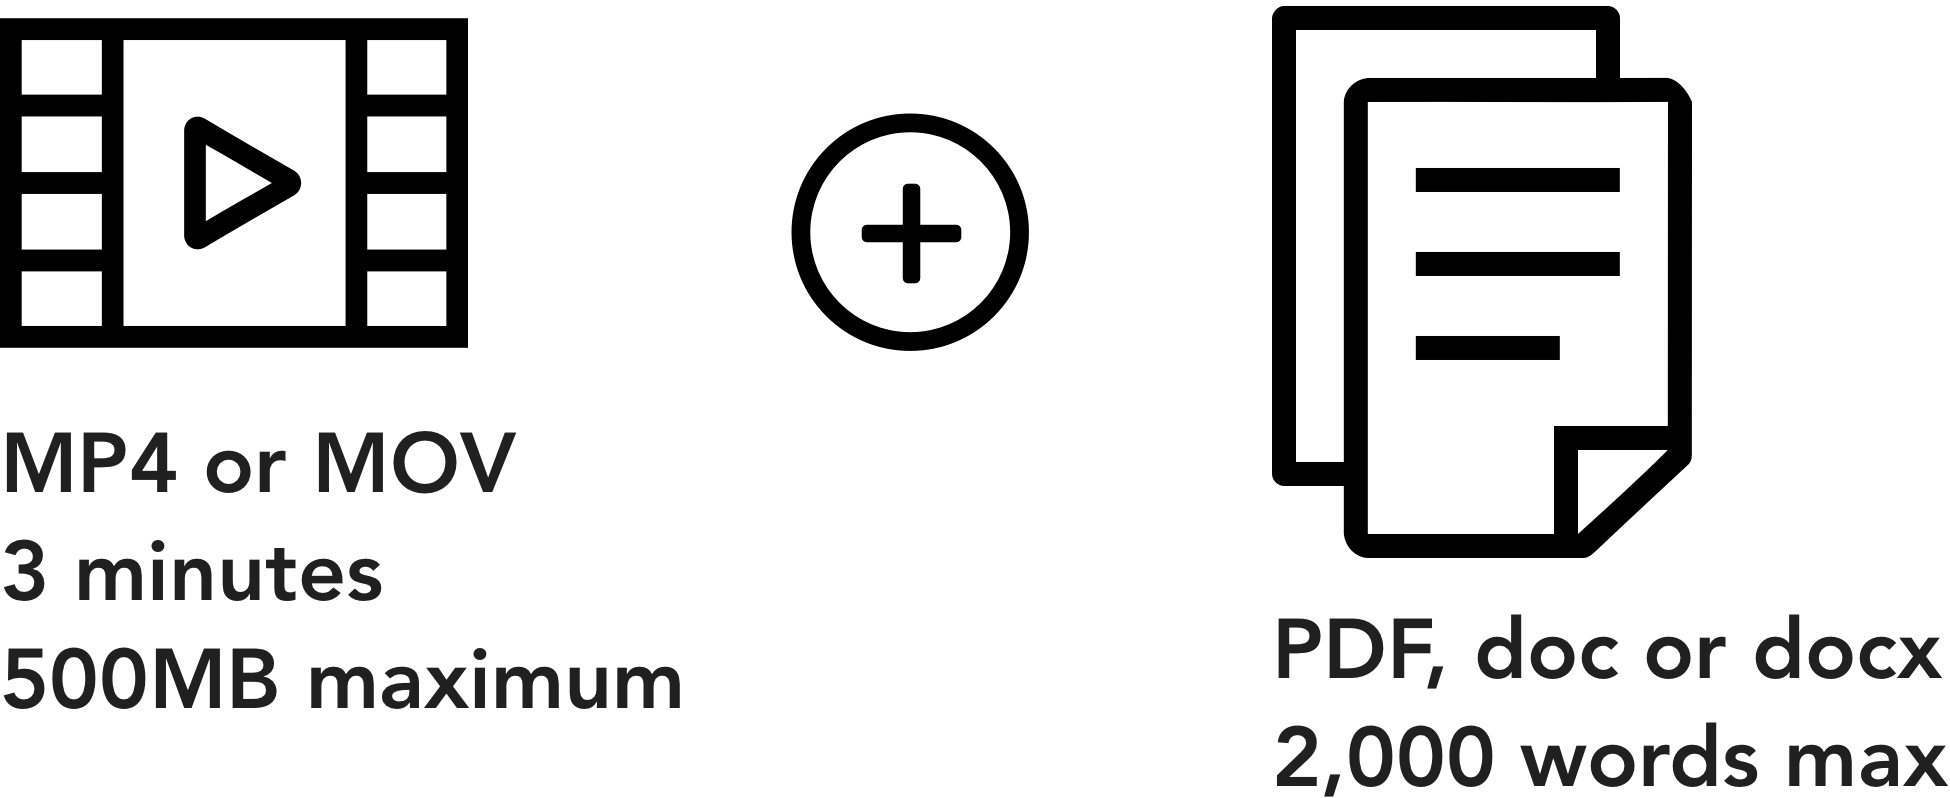 MP4, PDF icons